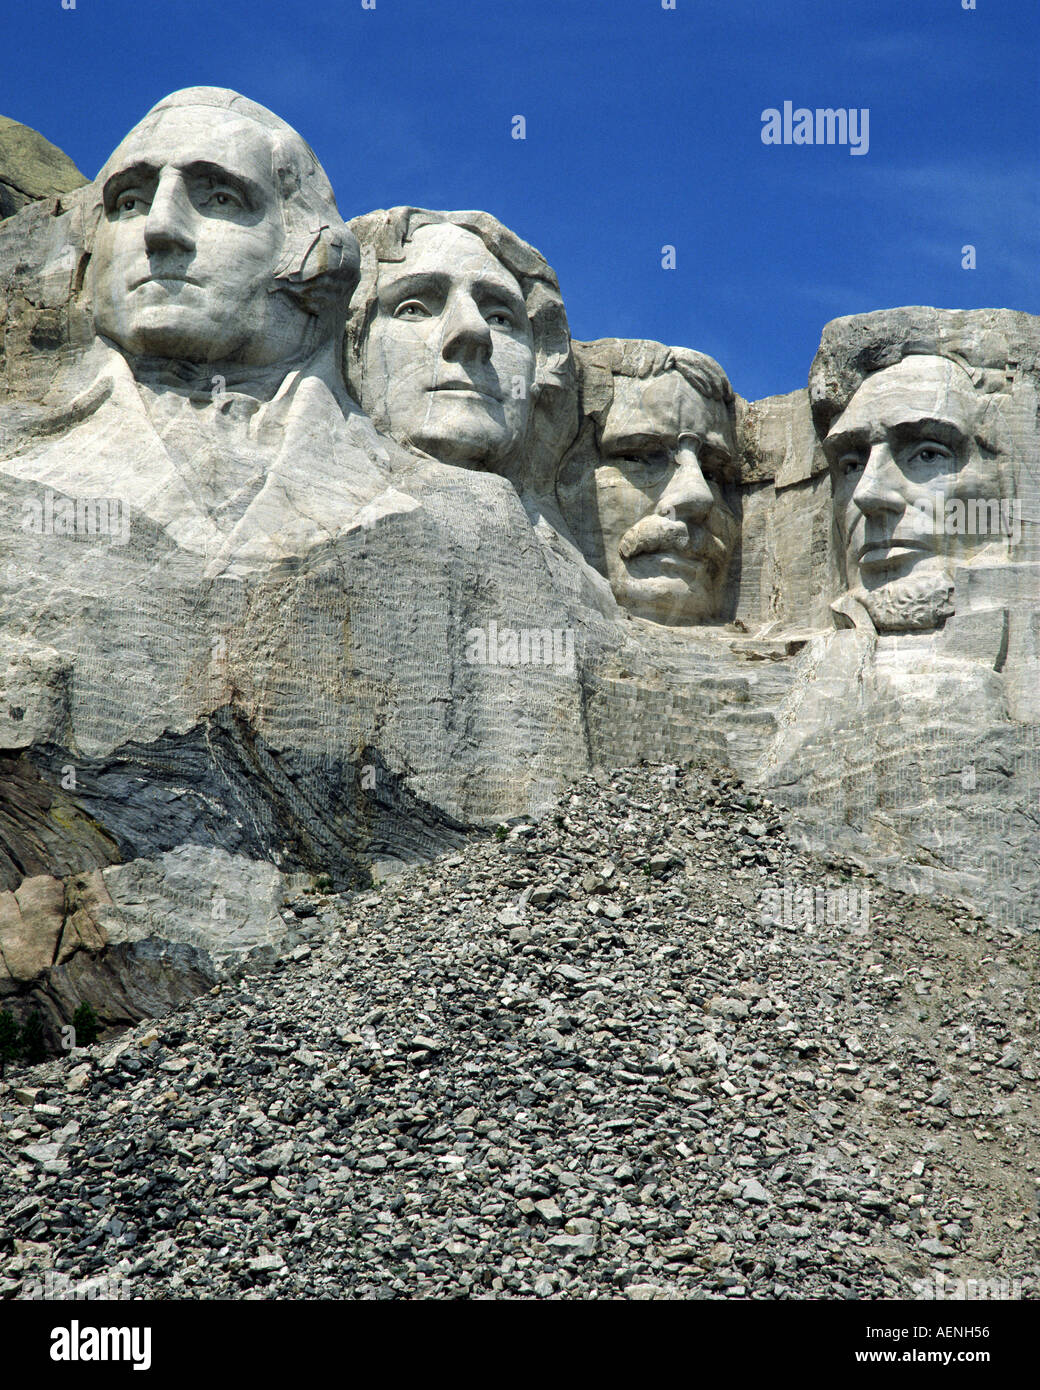 USA - SOUTH DAKOTA: Mount Rushmore National Memorial - Stock Image